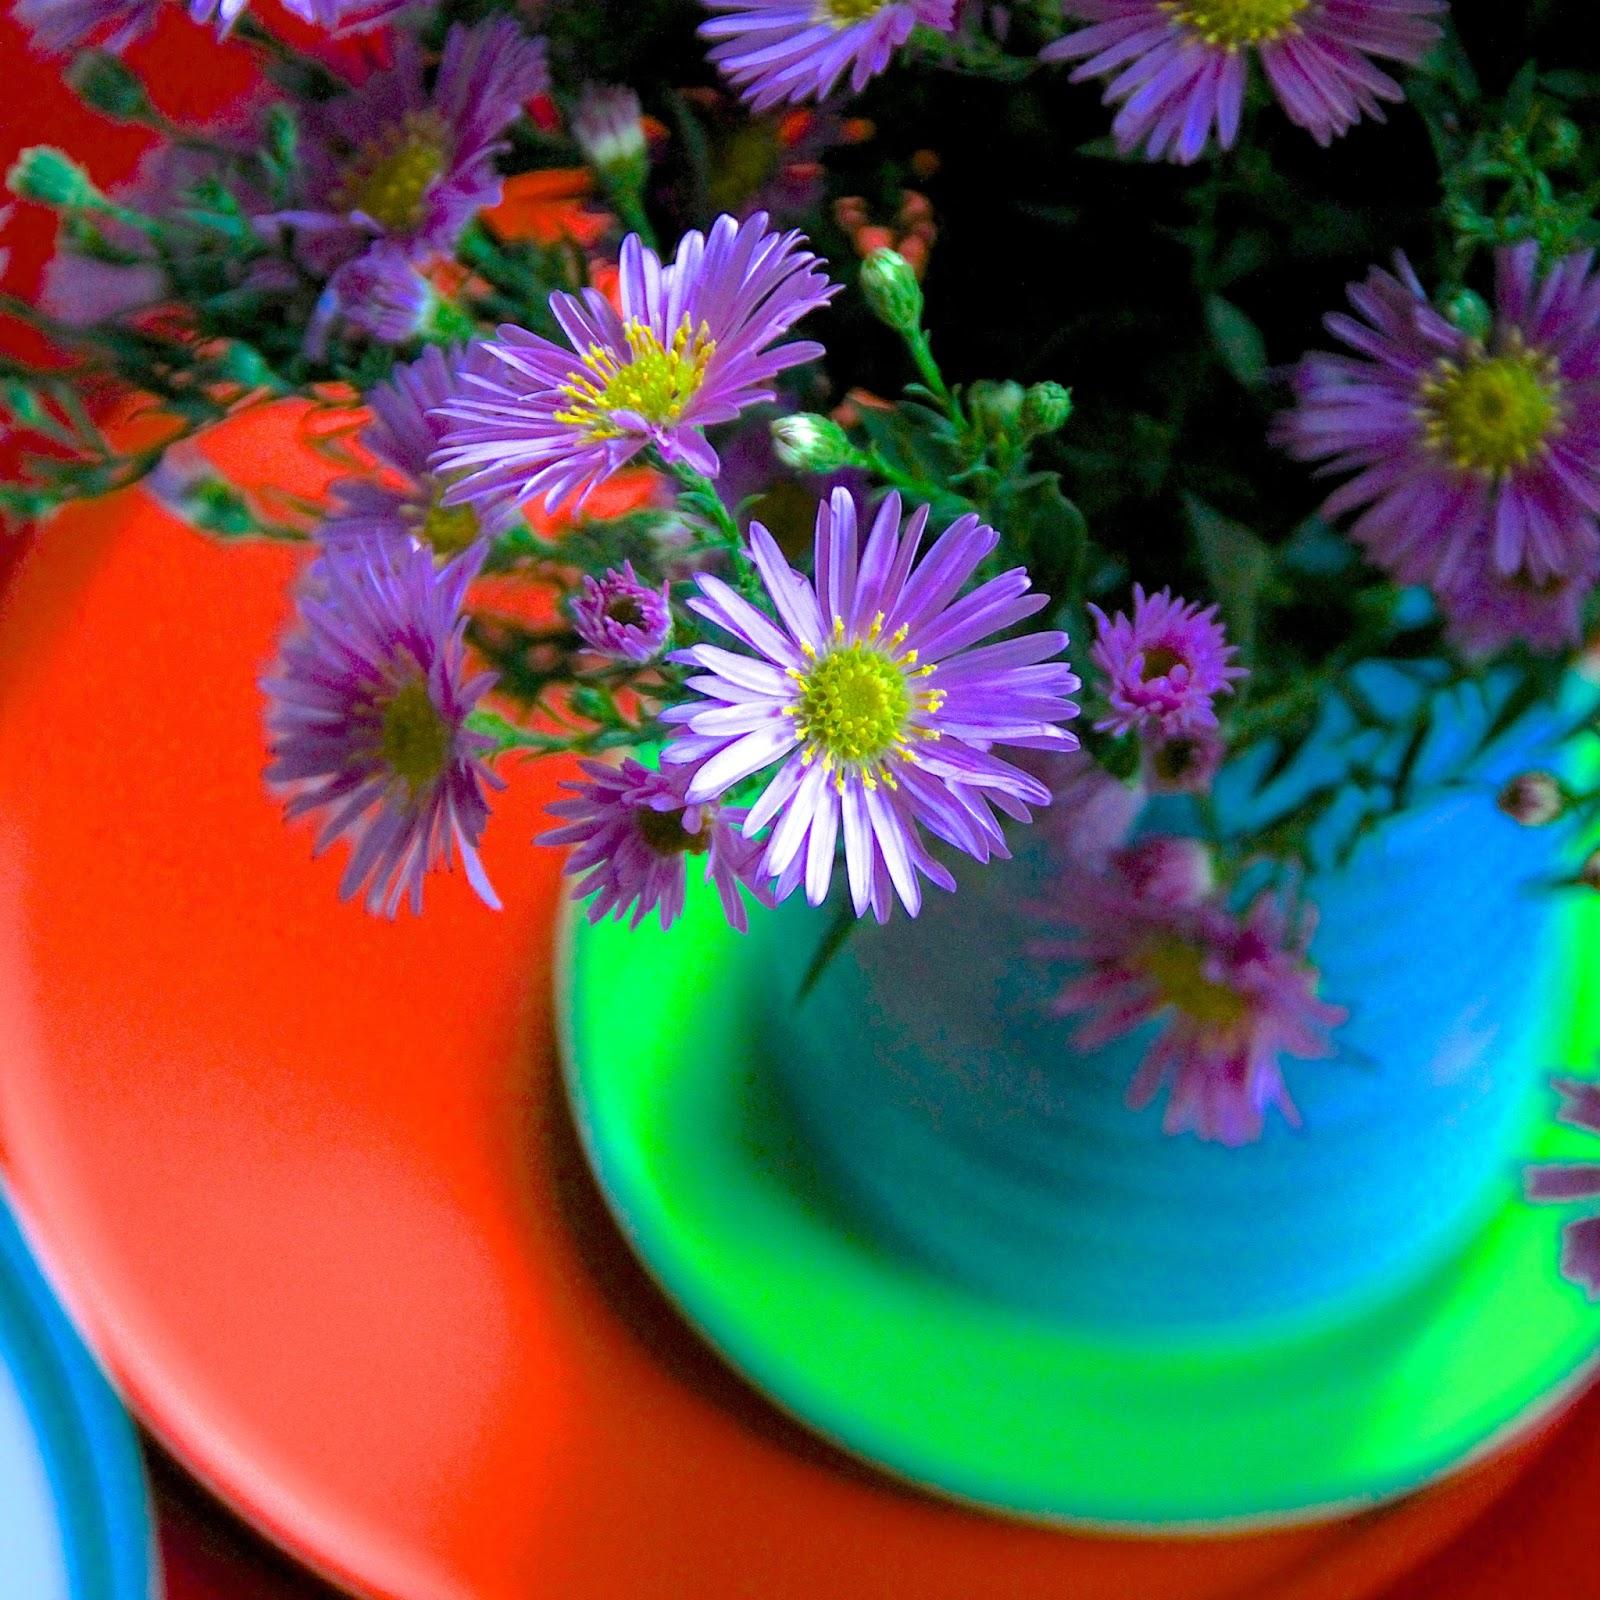 swig herbst farben der woche couleurs de la semaine colors of the week. Black Bedroom Furniture Sets. Home Design Ideas